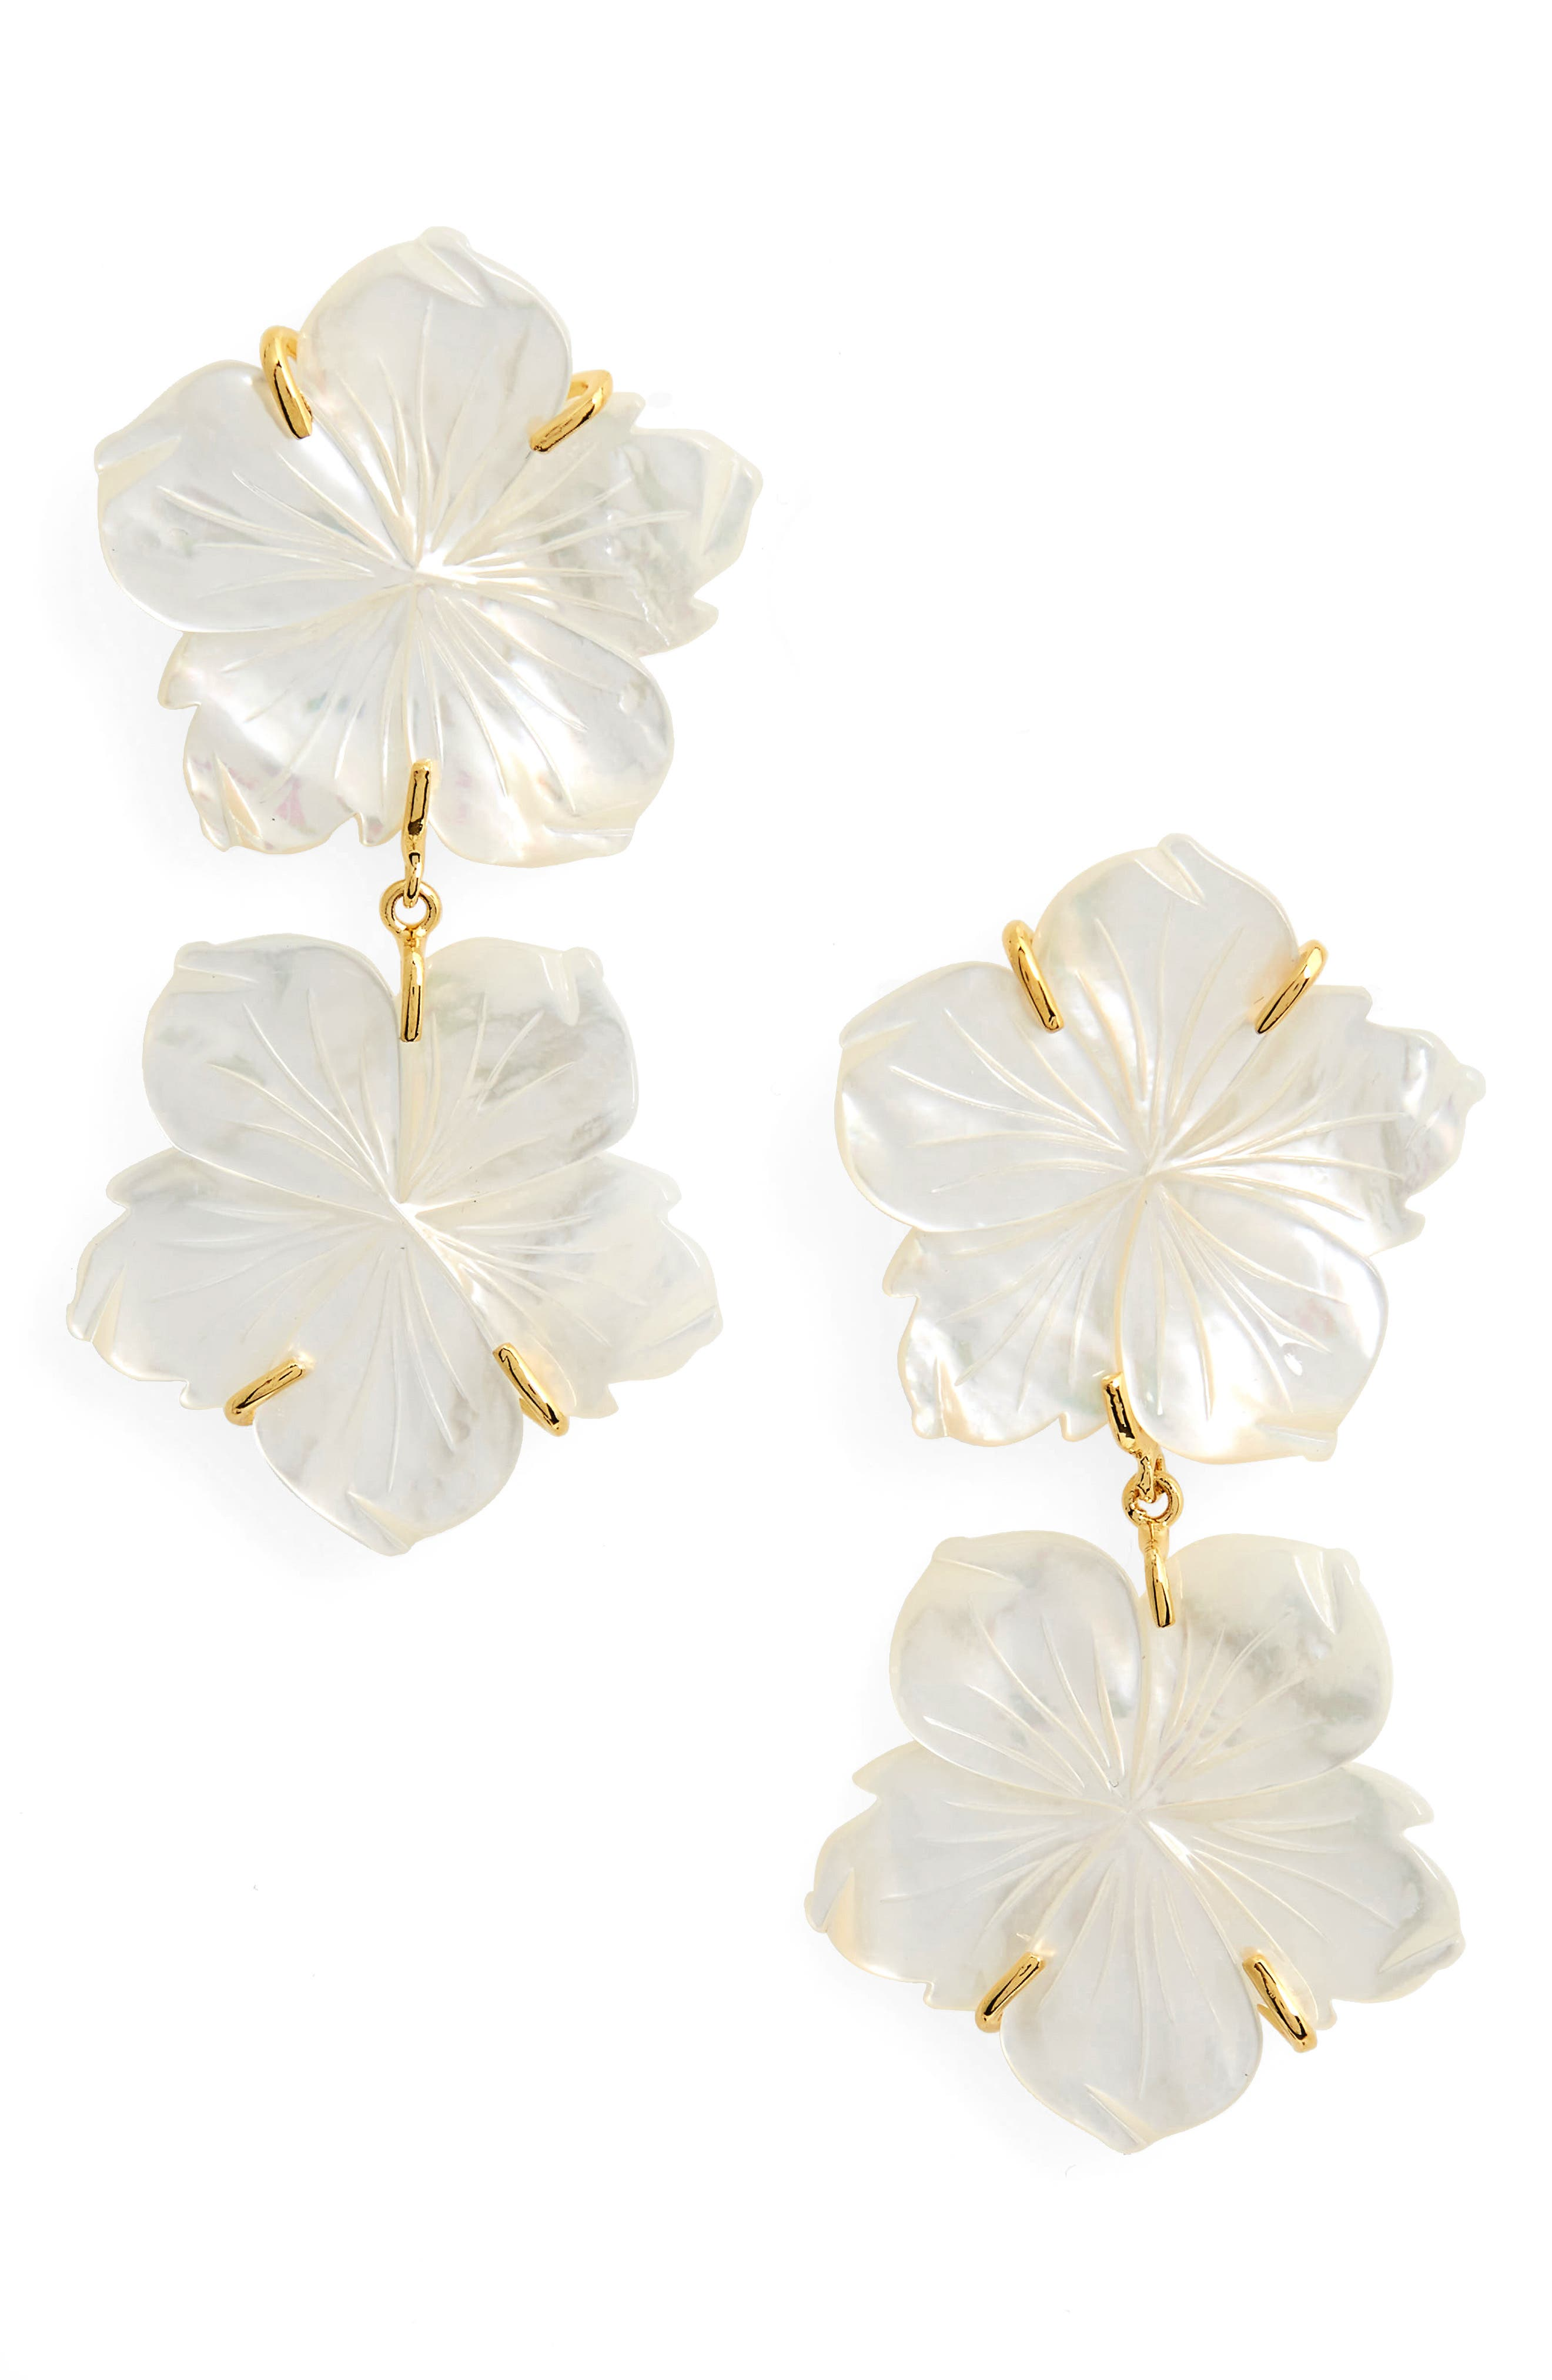 Paperwhite Drop Earrings,                             Main thumbnail 1, color,                             Multi